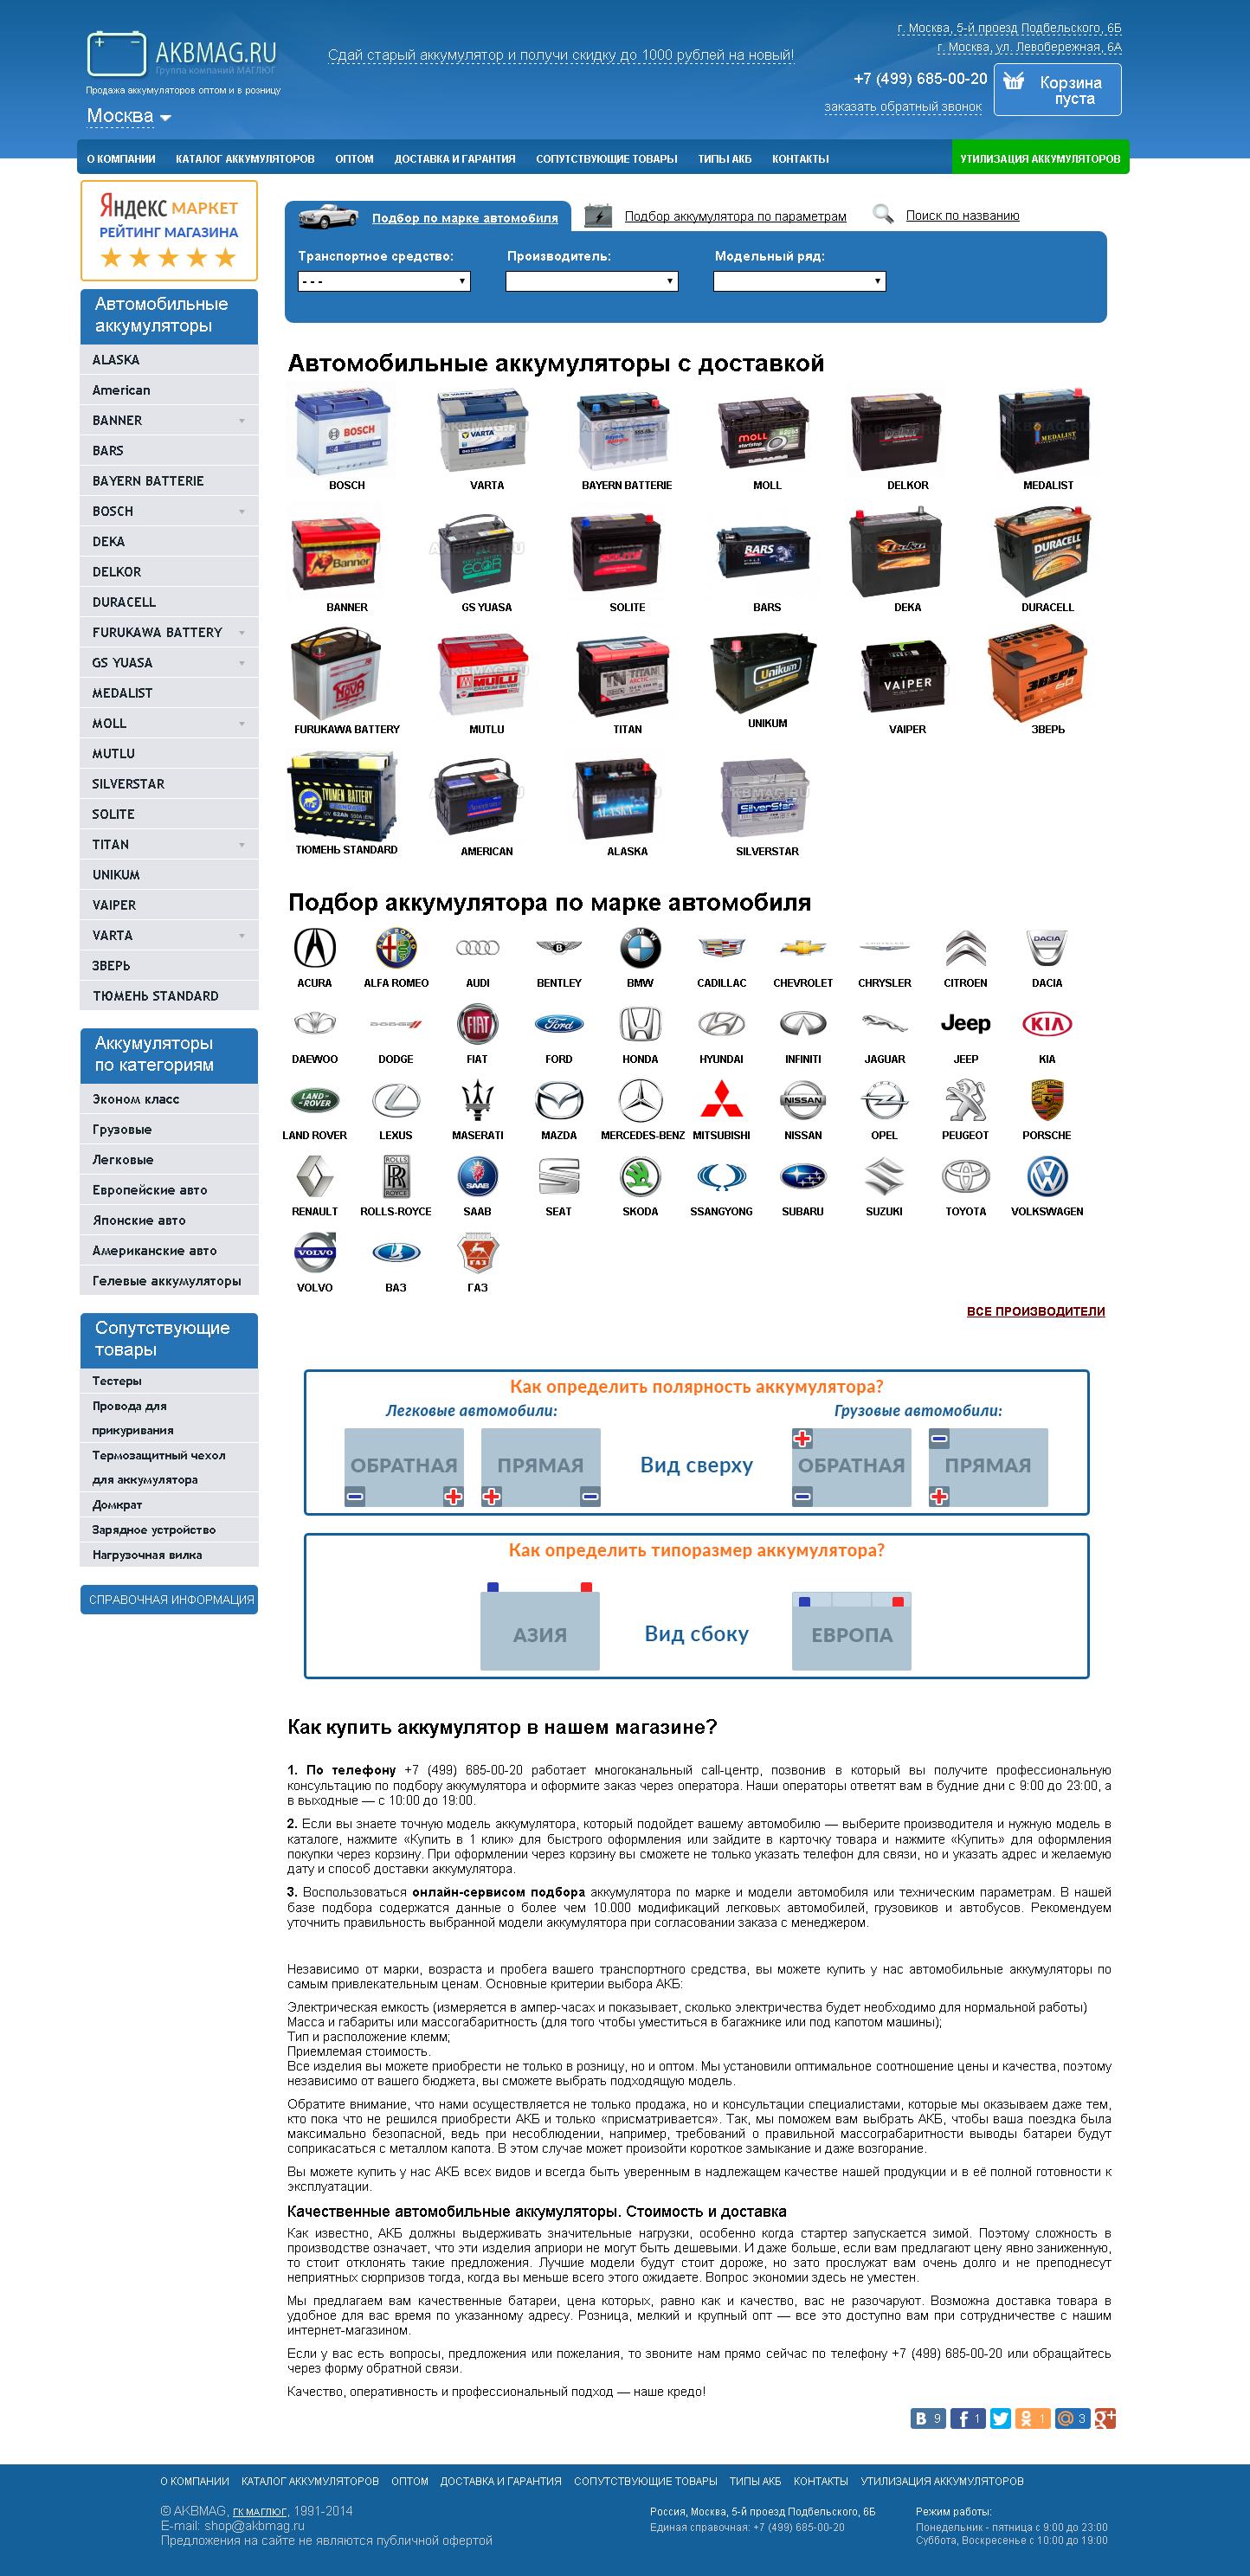 интернет-магазин аккумуляторов для авто AKBMAG.ru